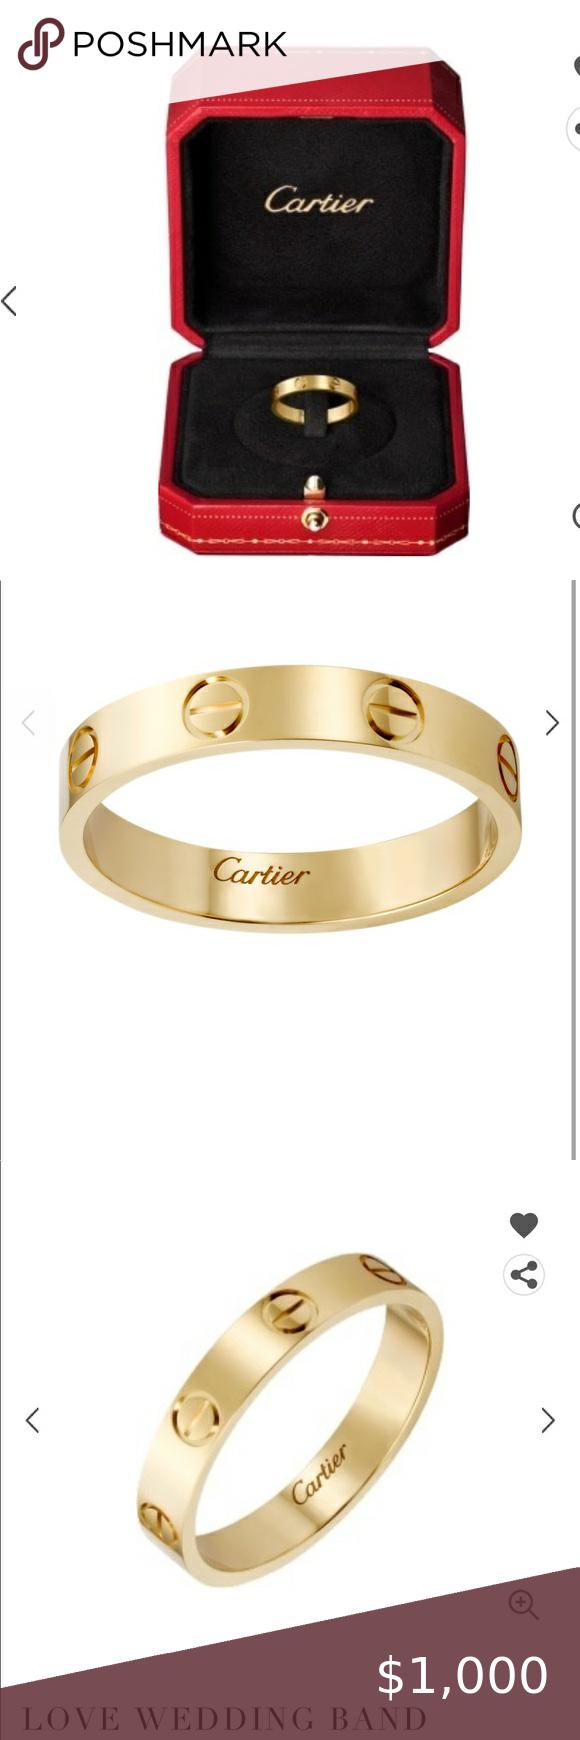 Cartier LOVE WEDDING BAND YELLOW GOLD LOVE WEDDING BAND